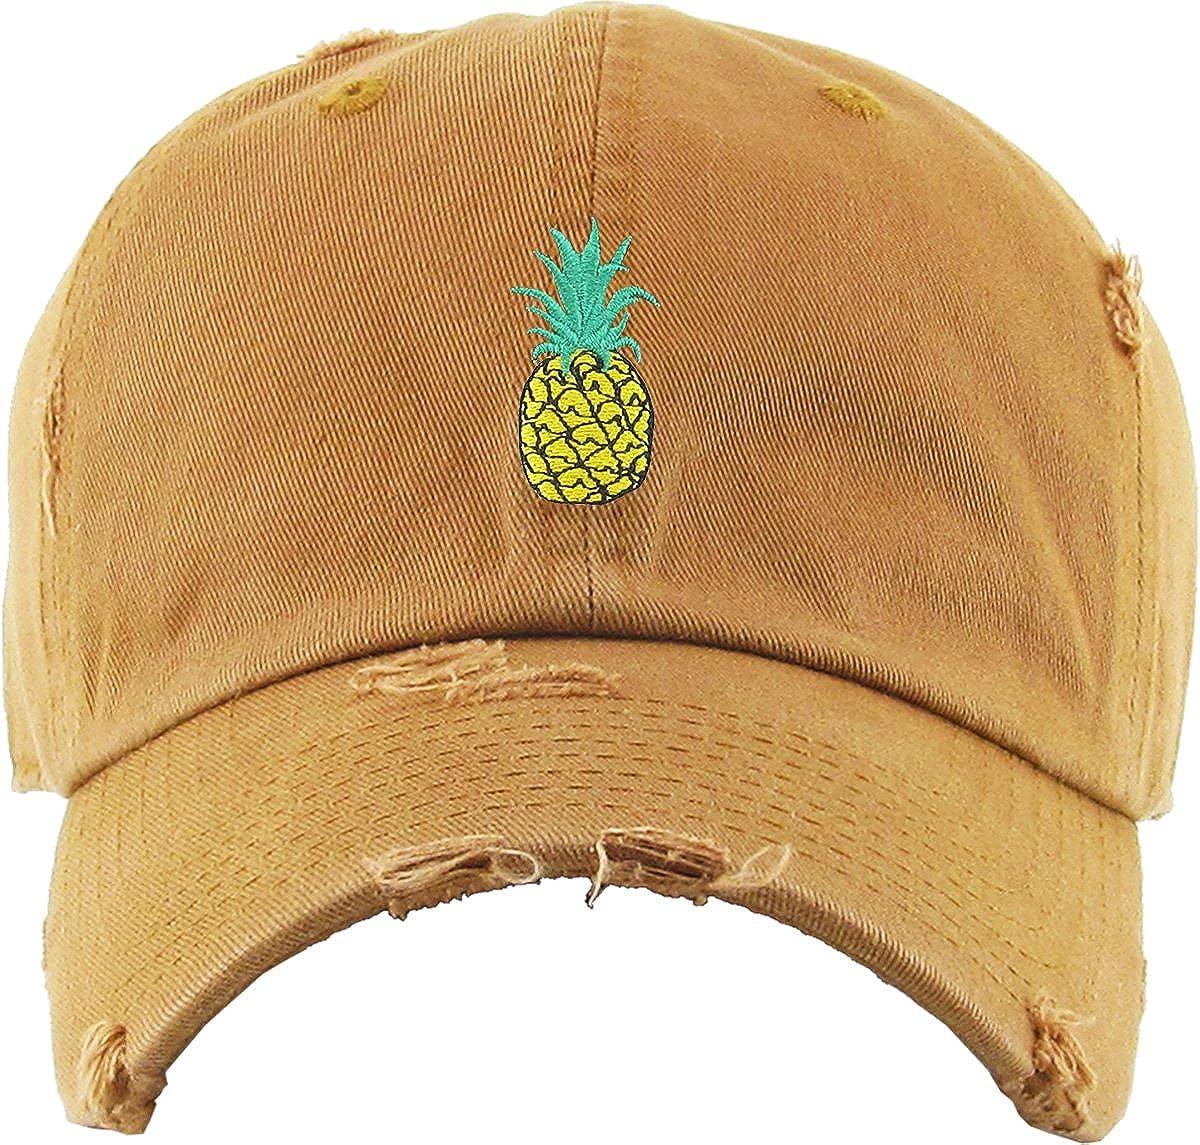 KBETHOS Pineapple Dad Hat Baseball Cap Polo Style Unconstructed